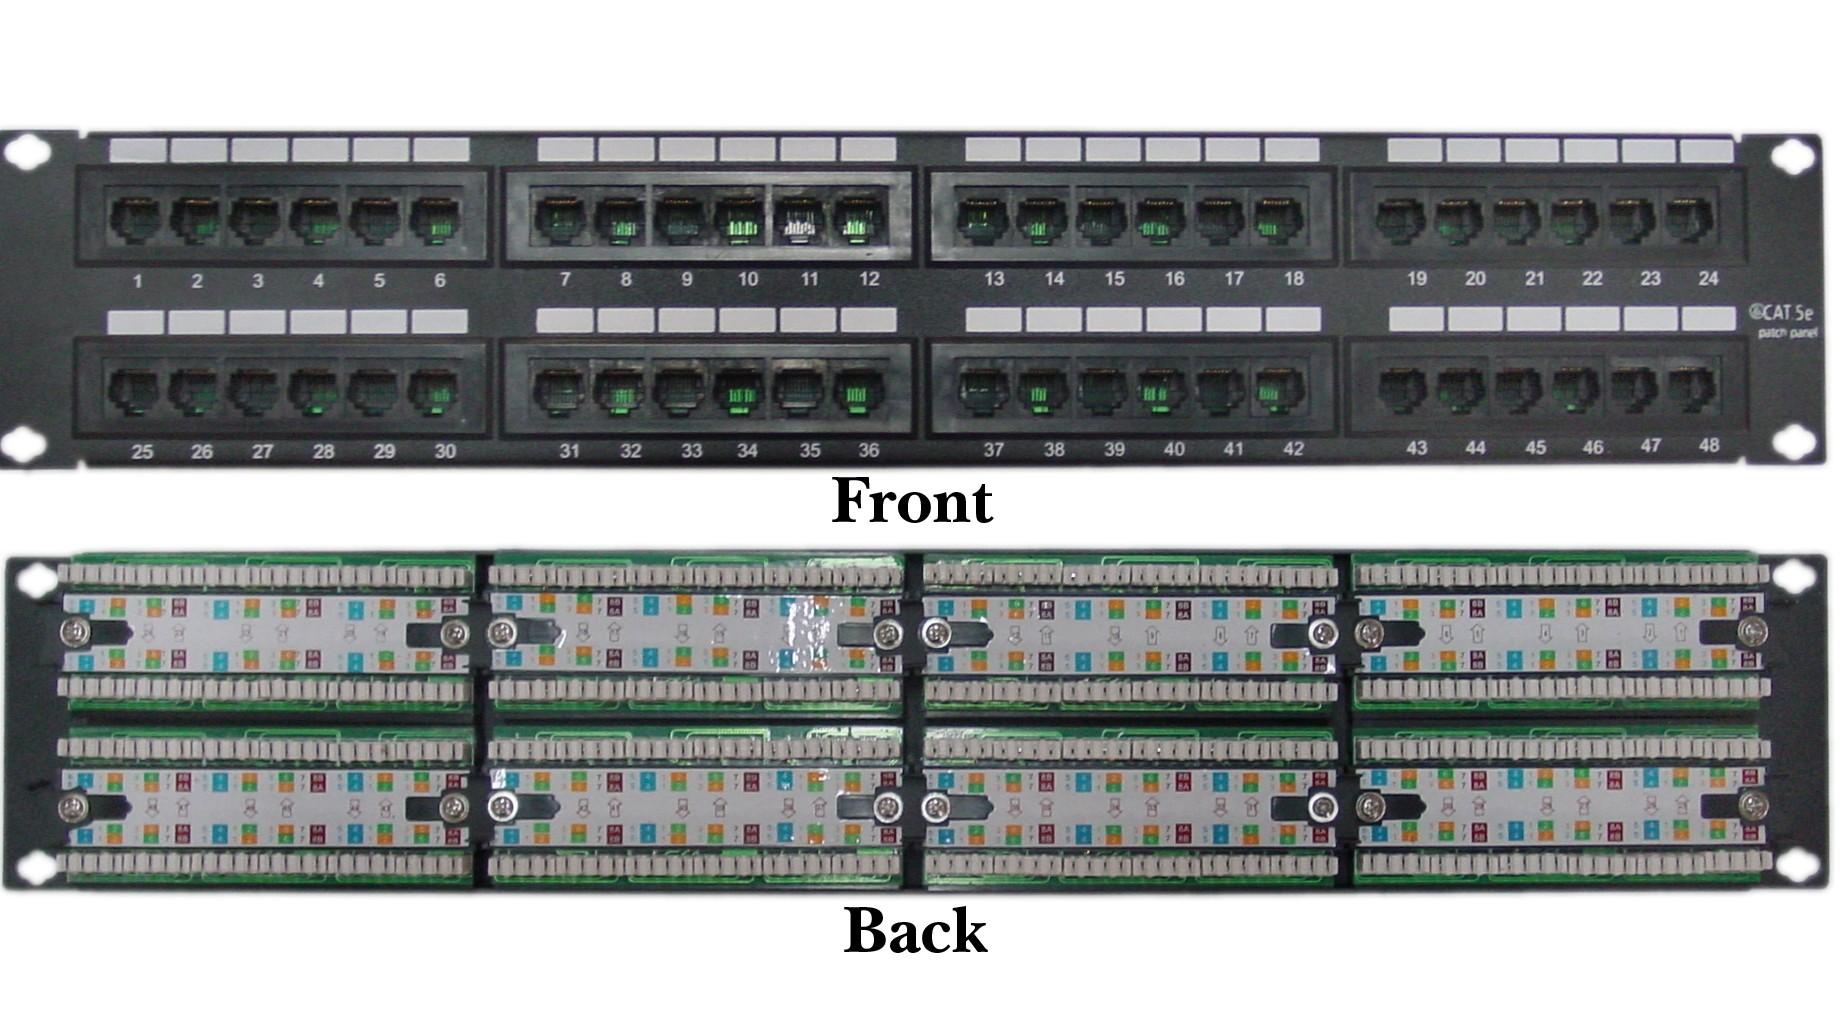 cat6 patch panel wiring diagram 06 yamaha raptor 700 touchtechblog